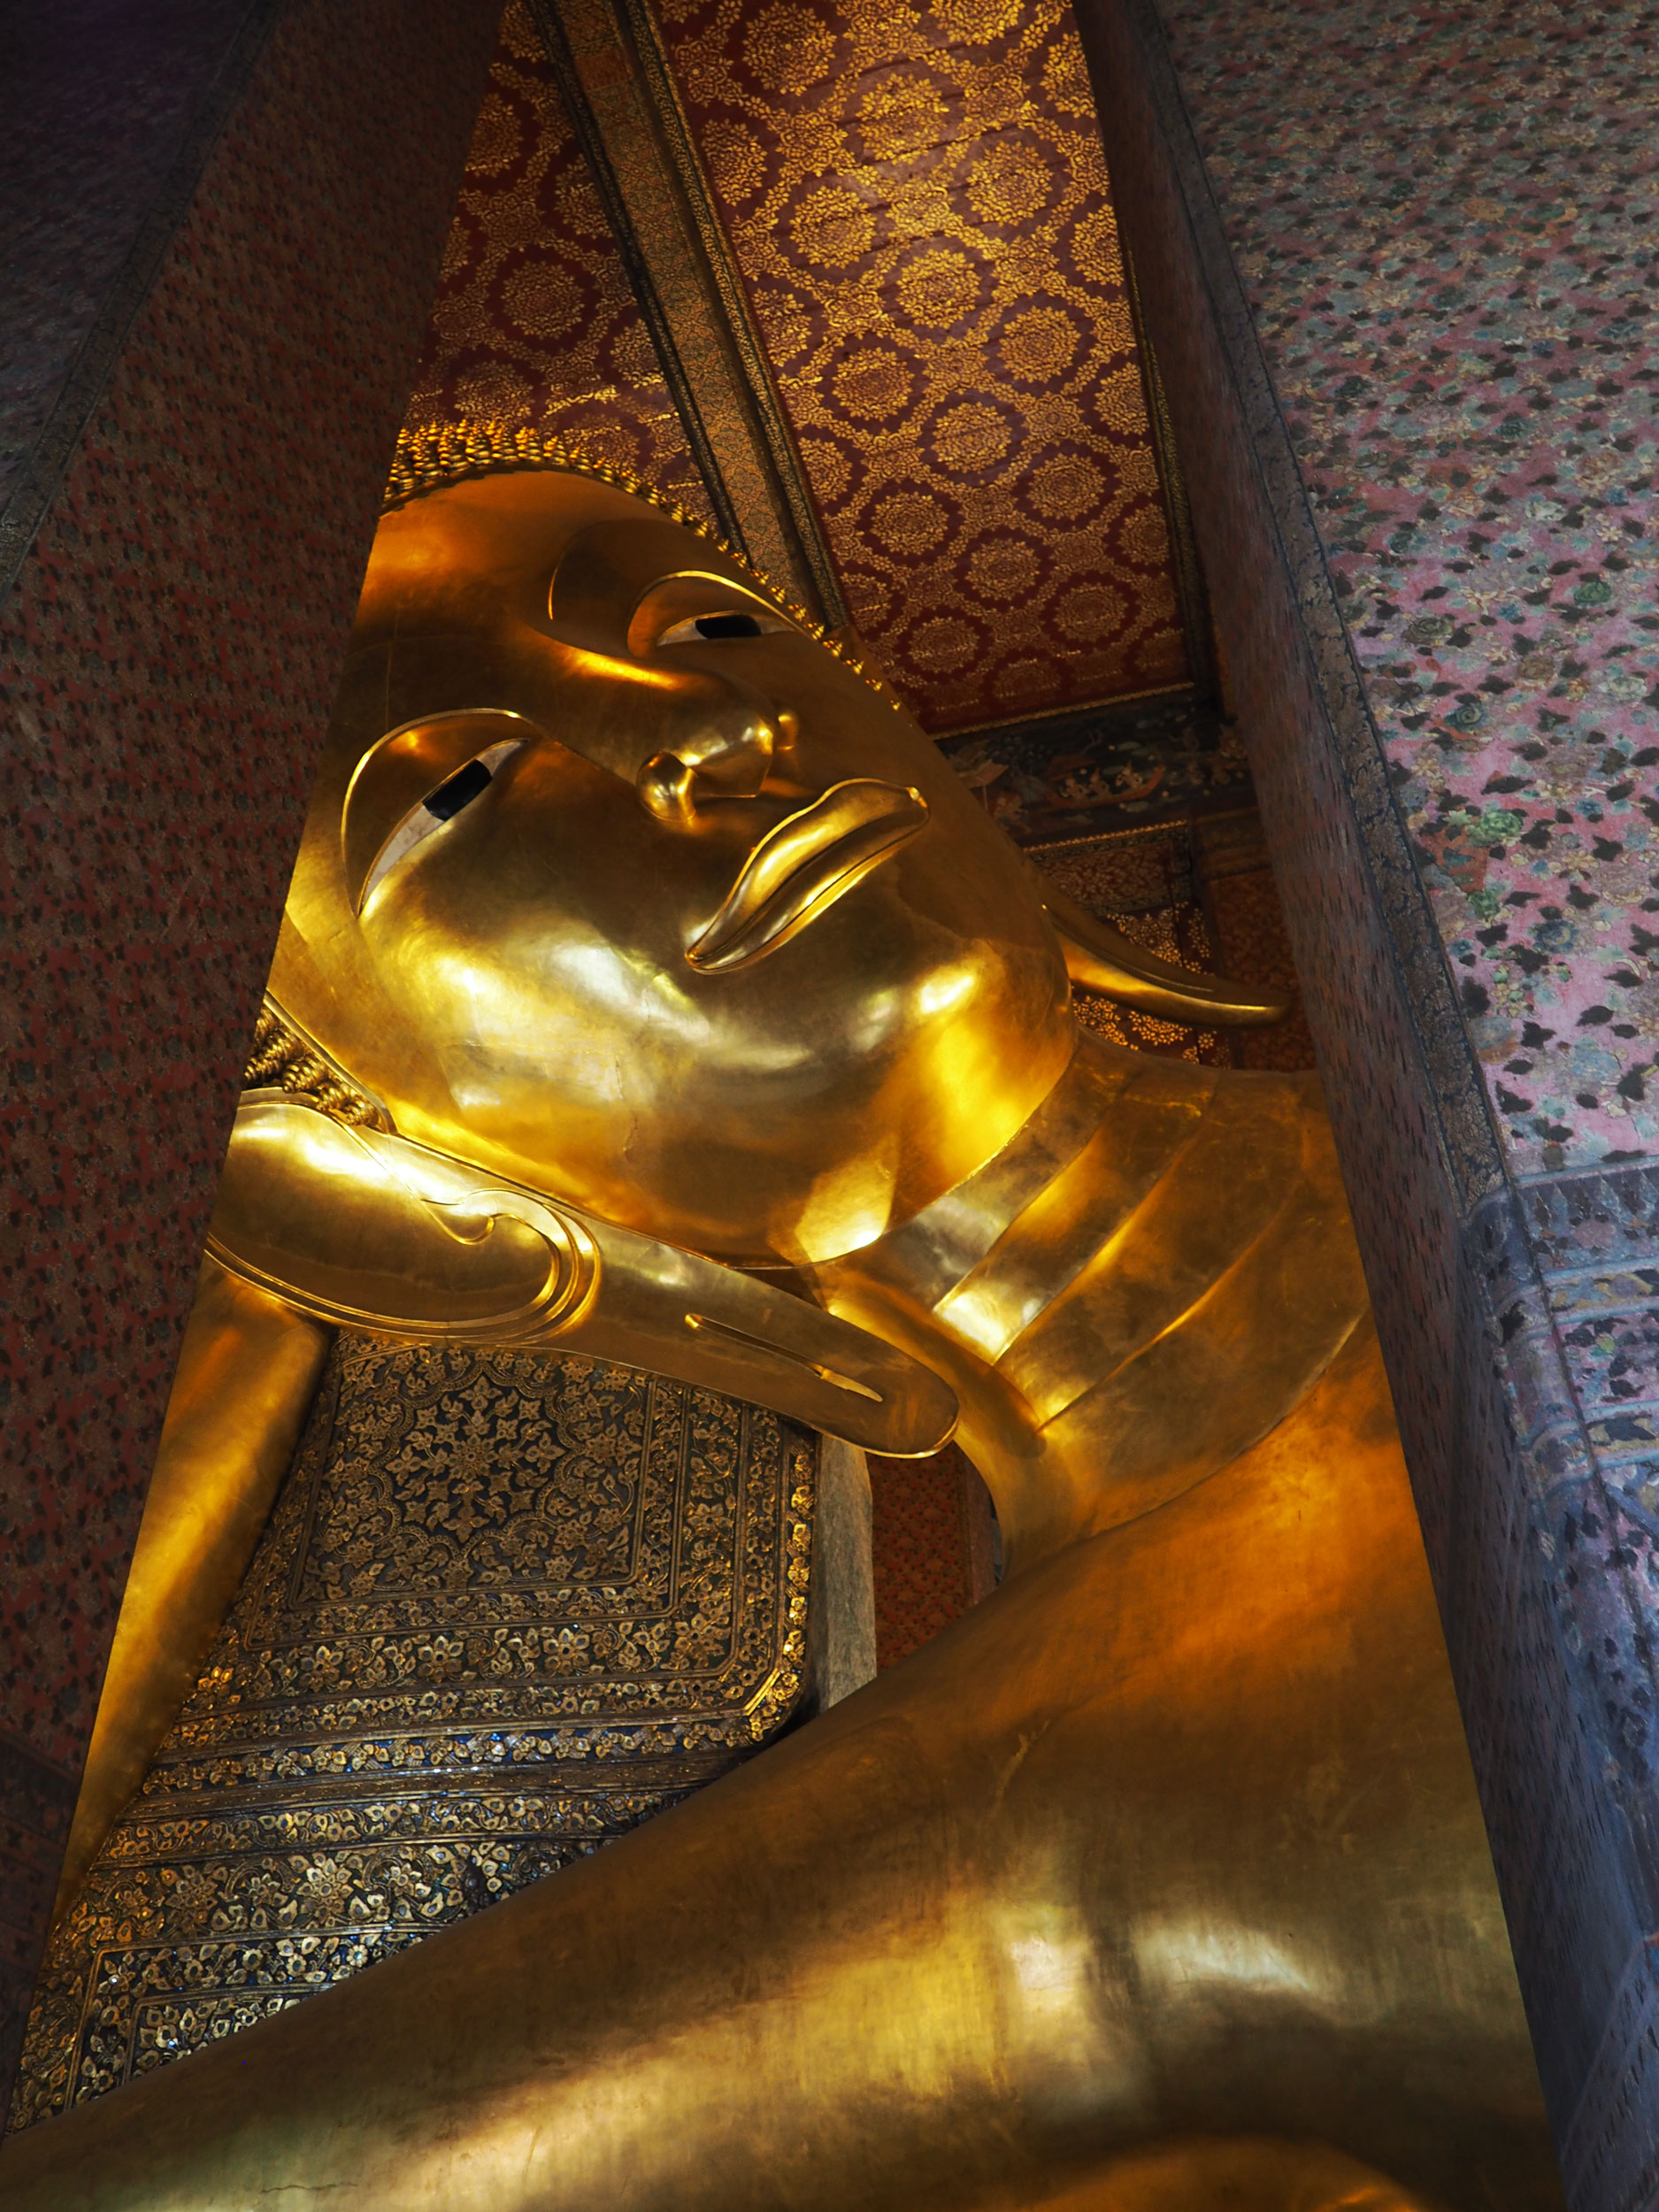 Buda de oro reclinado